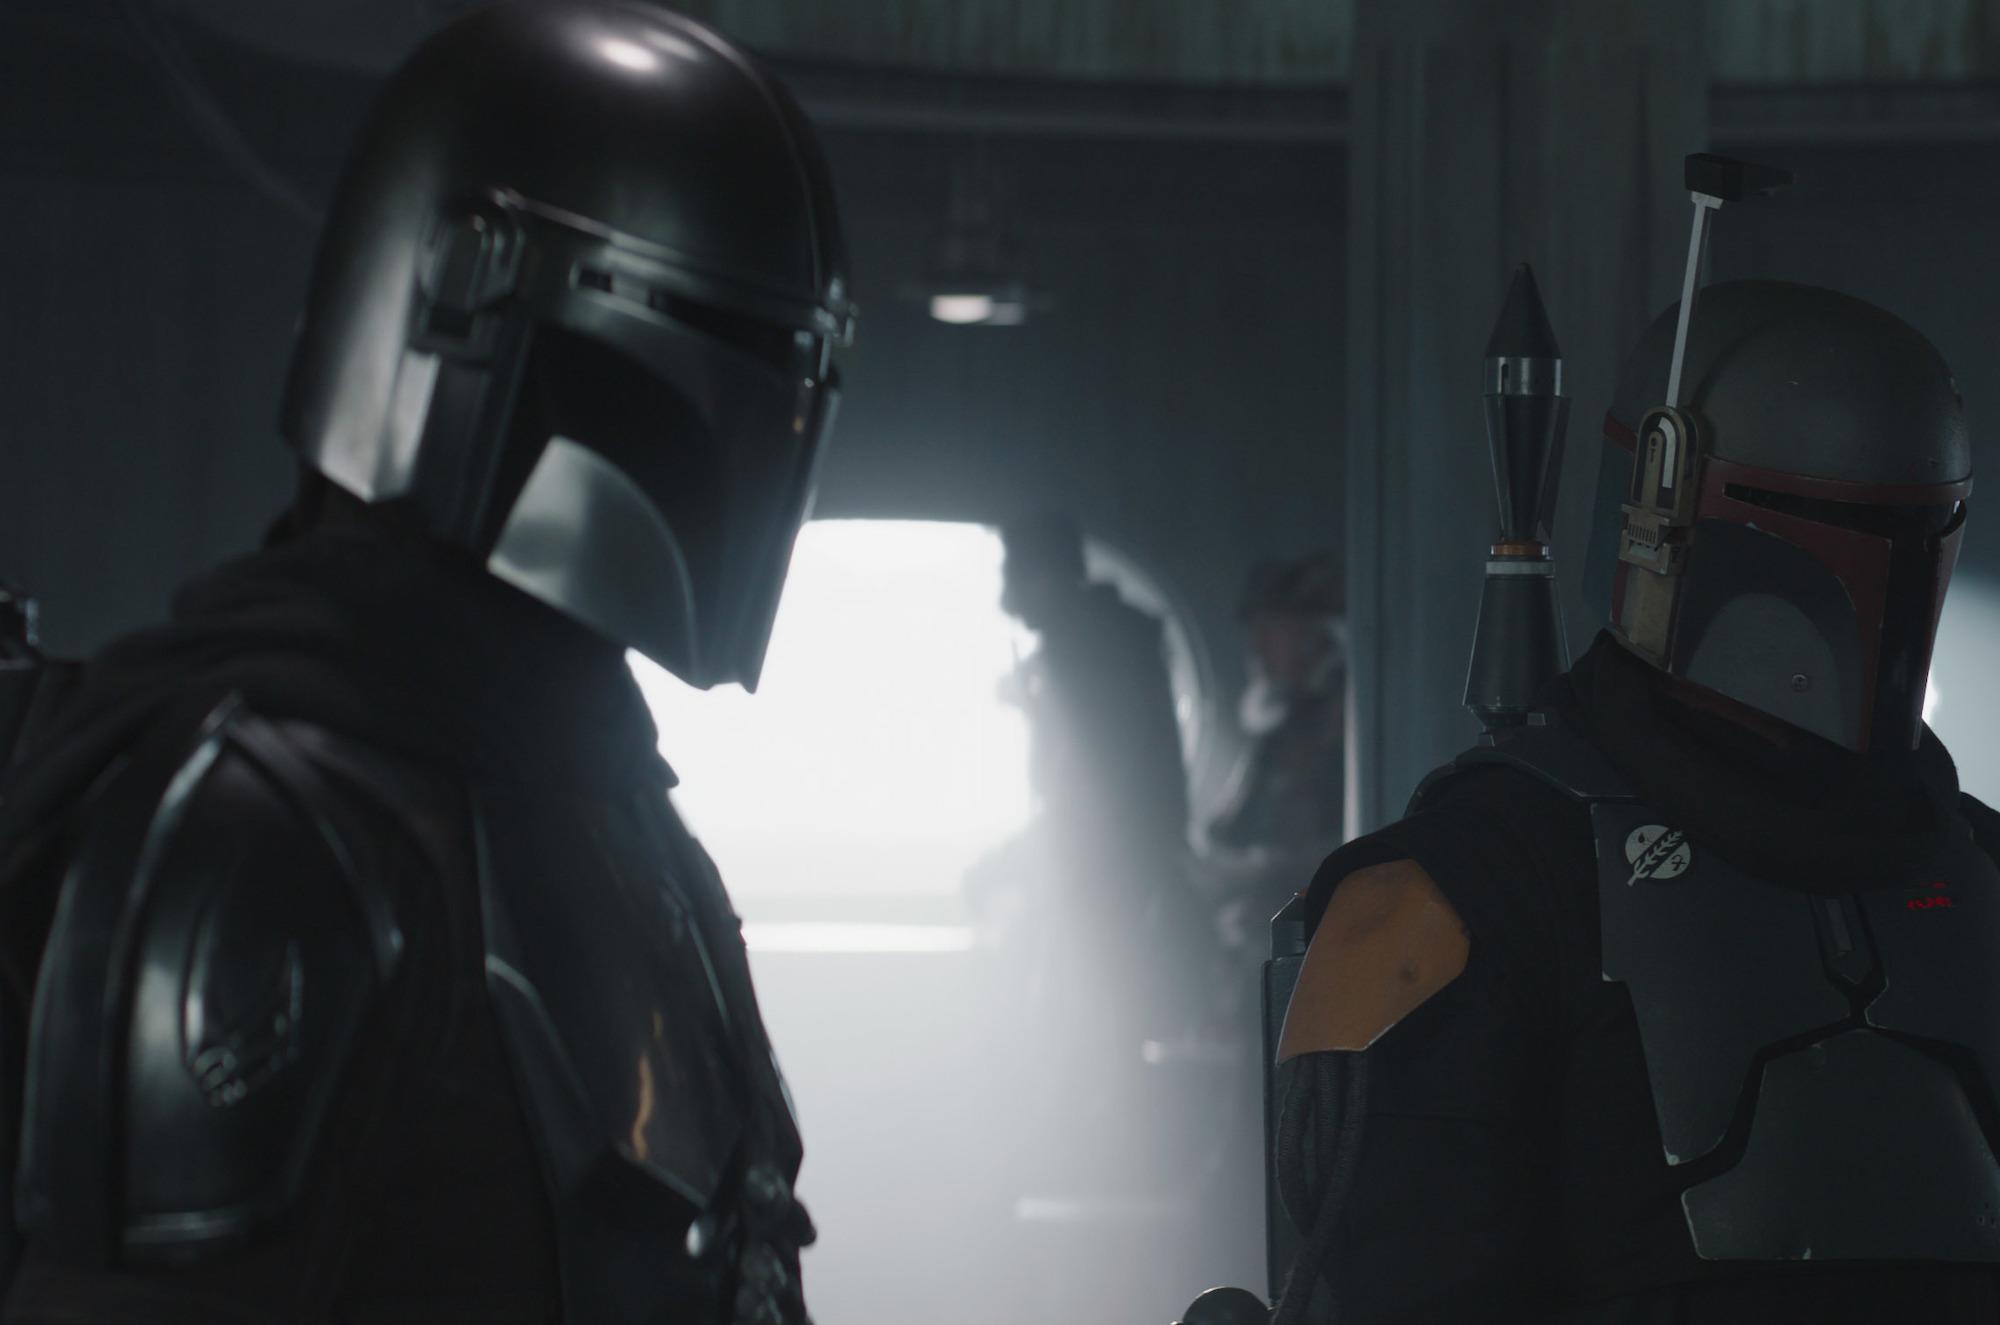 Mando and Boba Fett in season 2 of The Mandalorian.